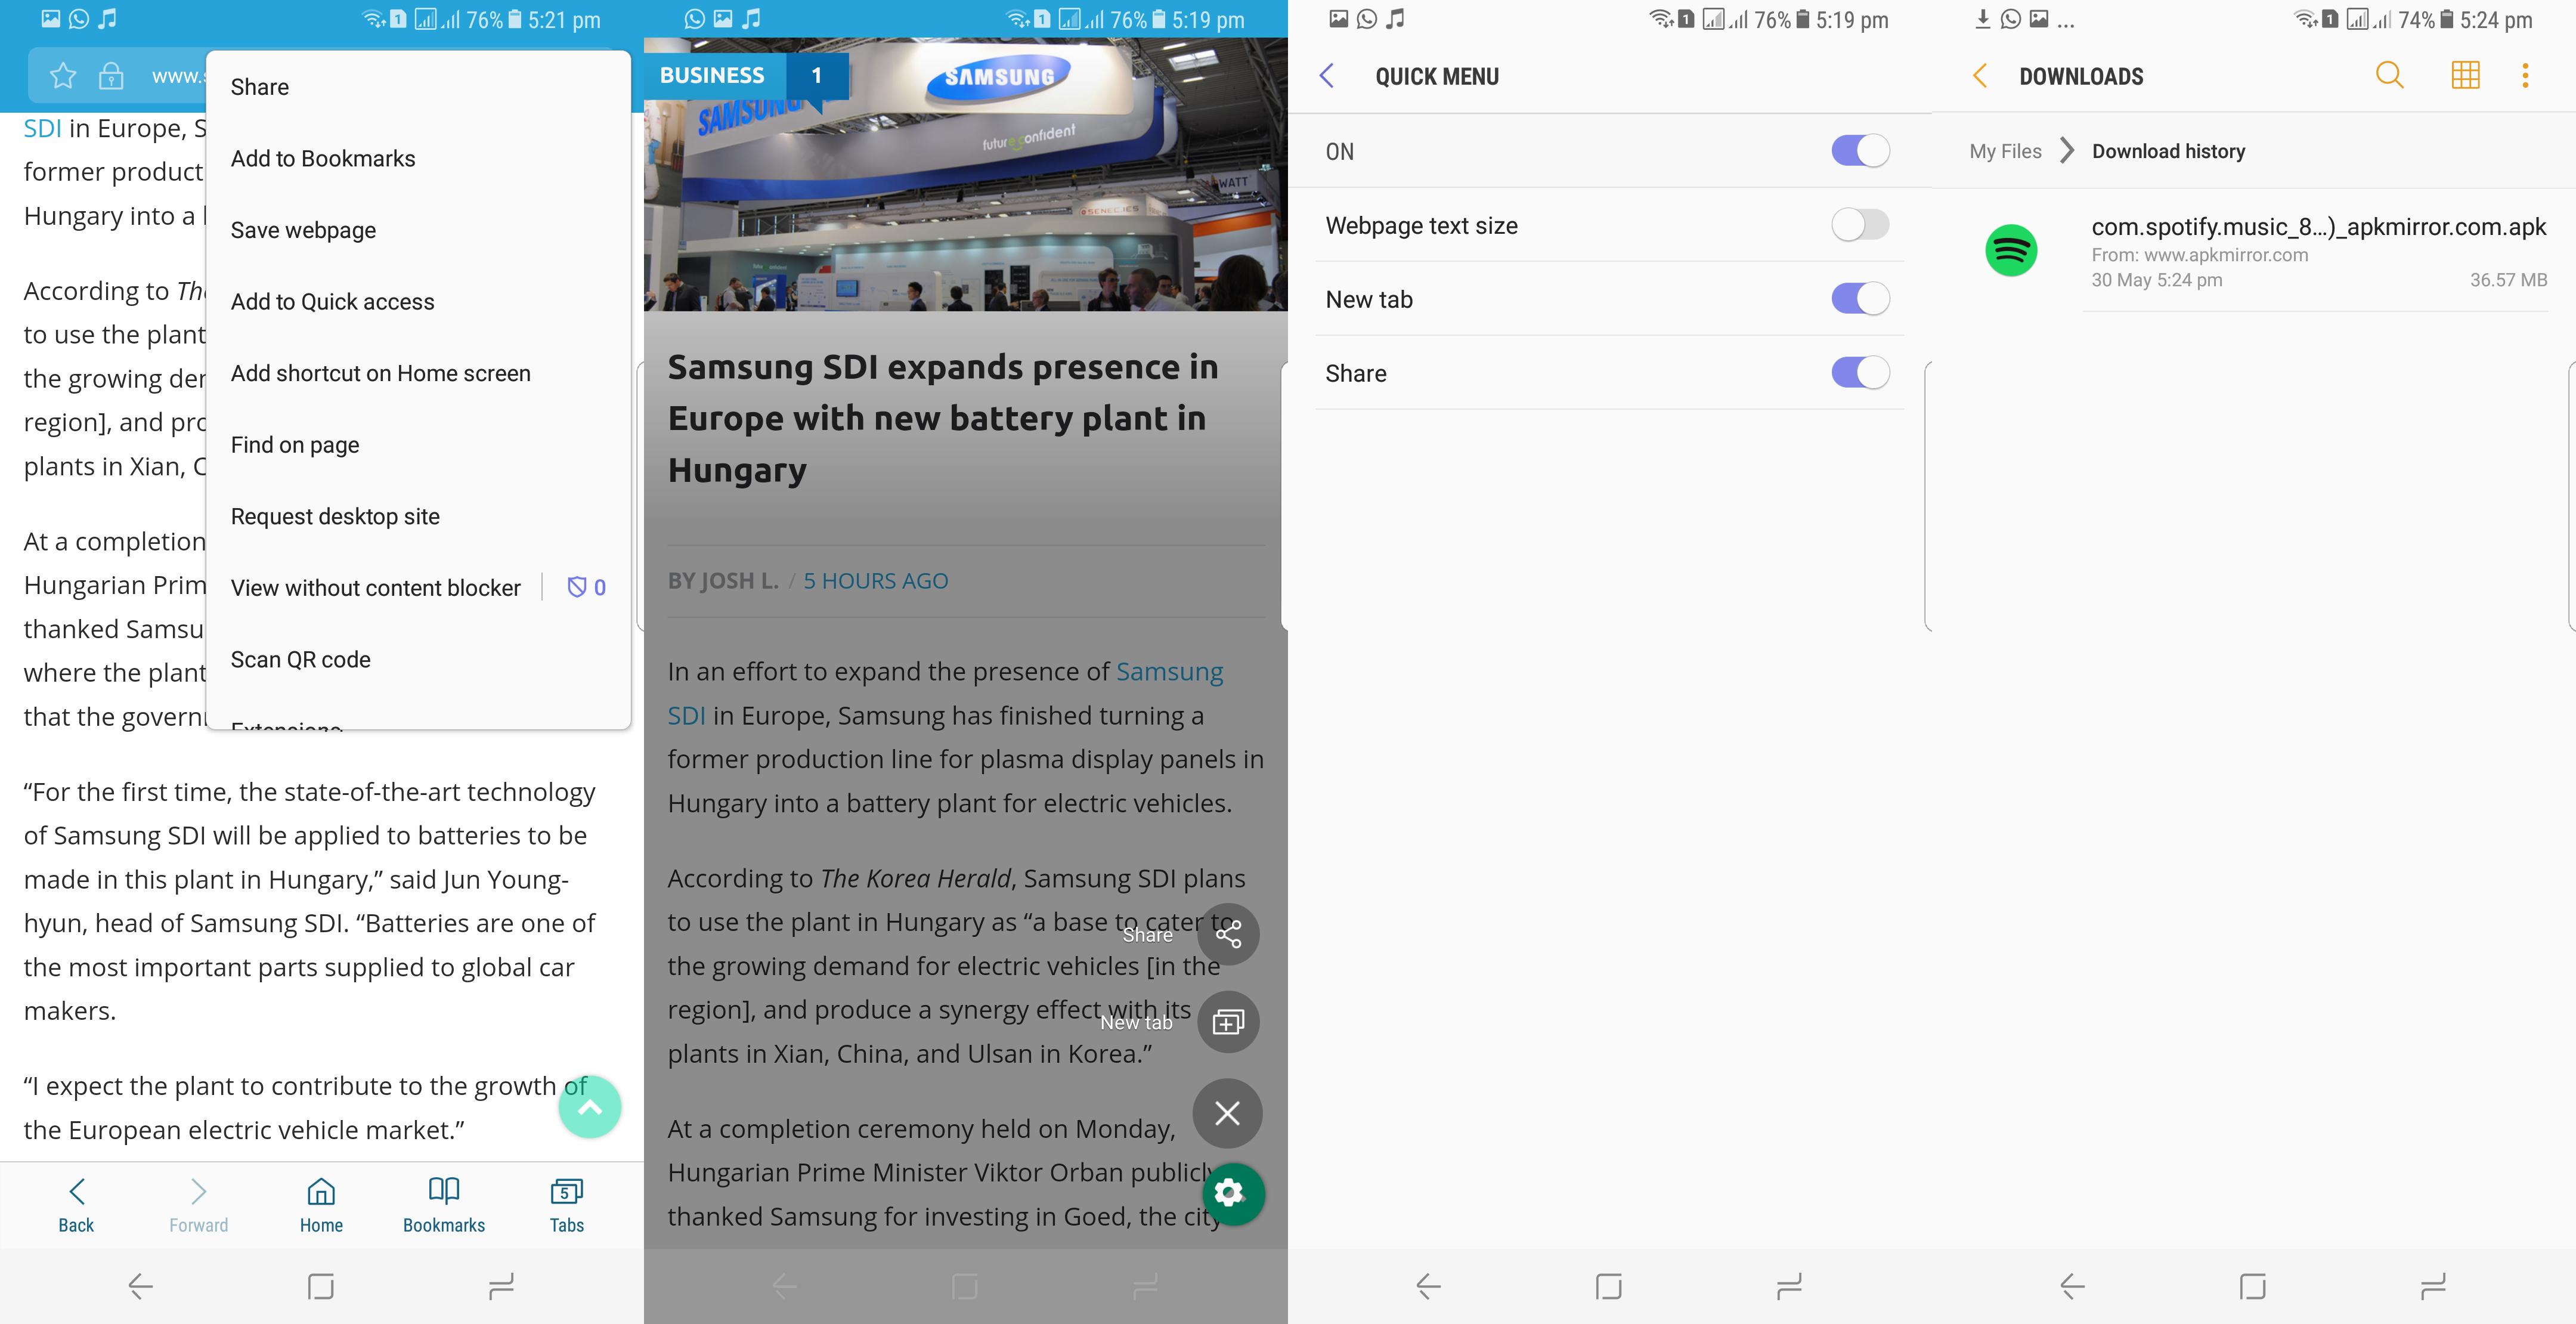 Samsung Internet Review - 03